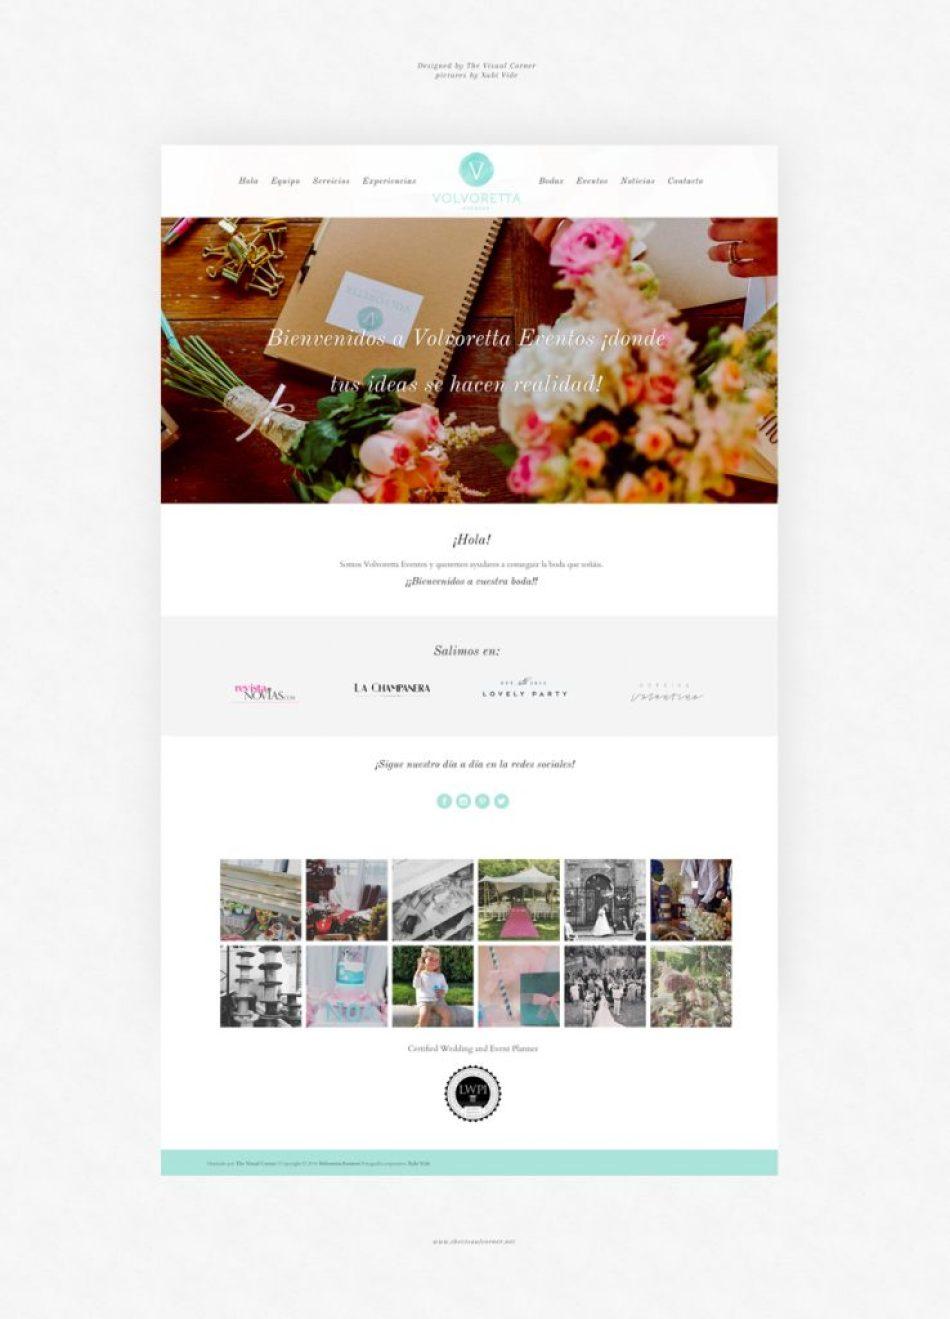 Diseño web para Volvoreta Eventos por The Visual Corner